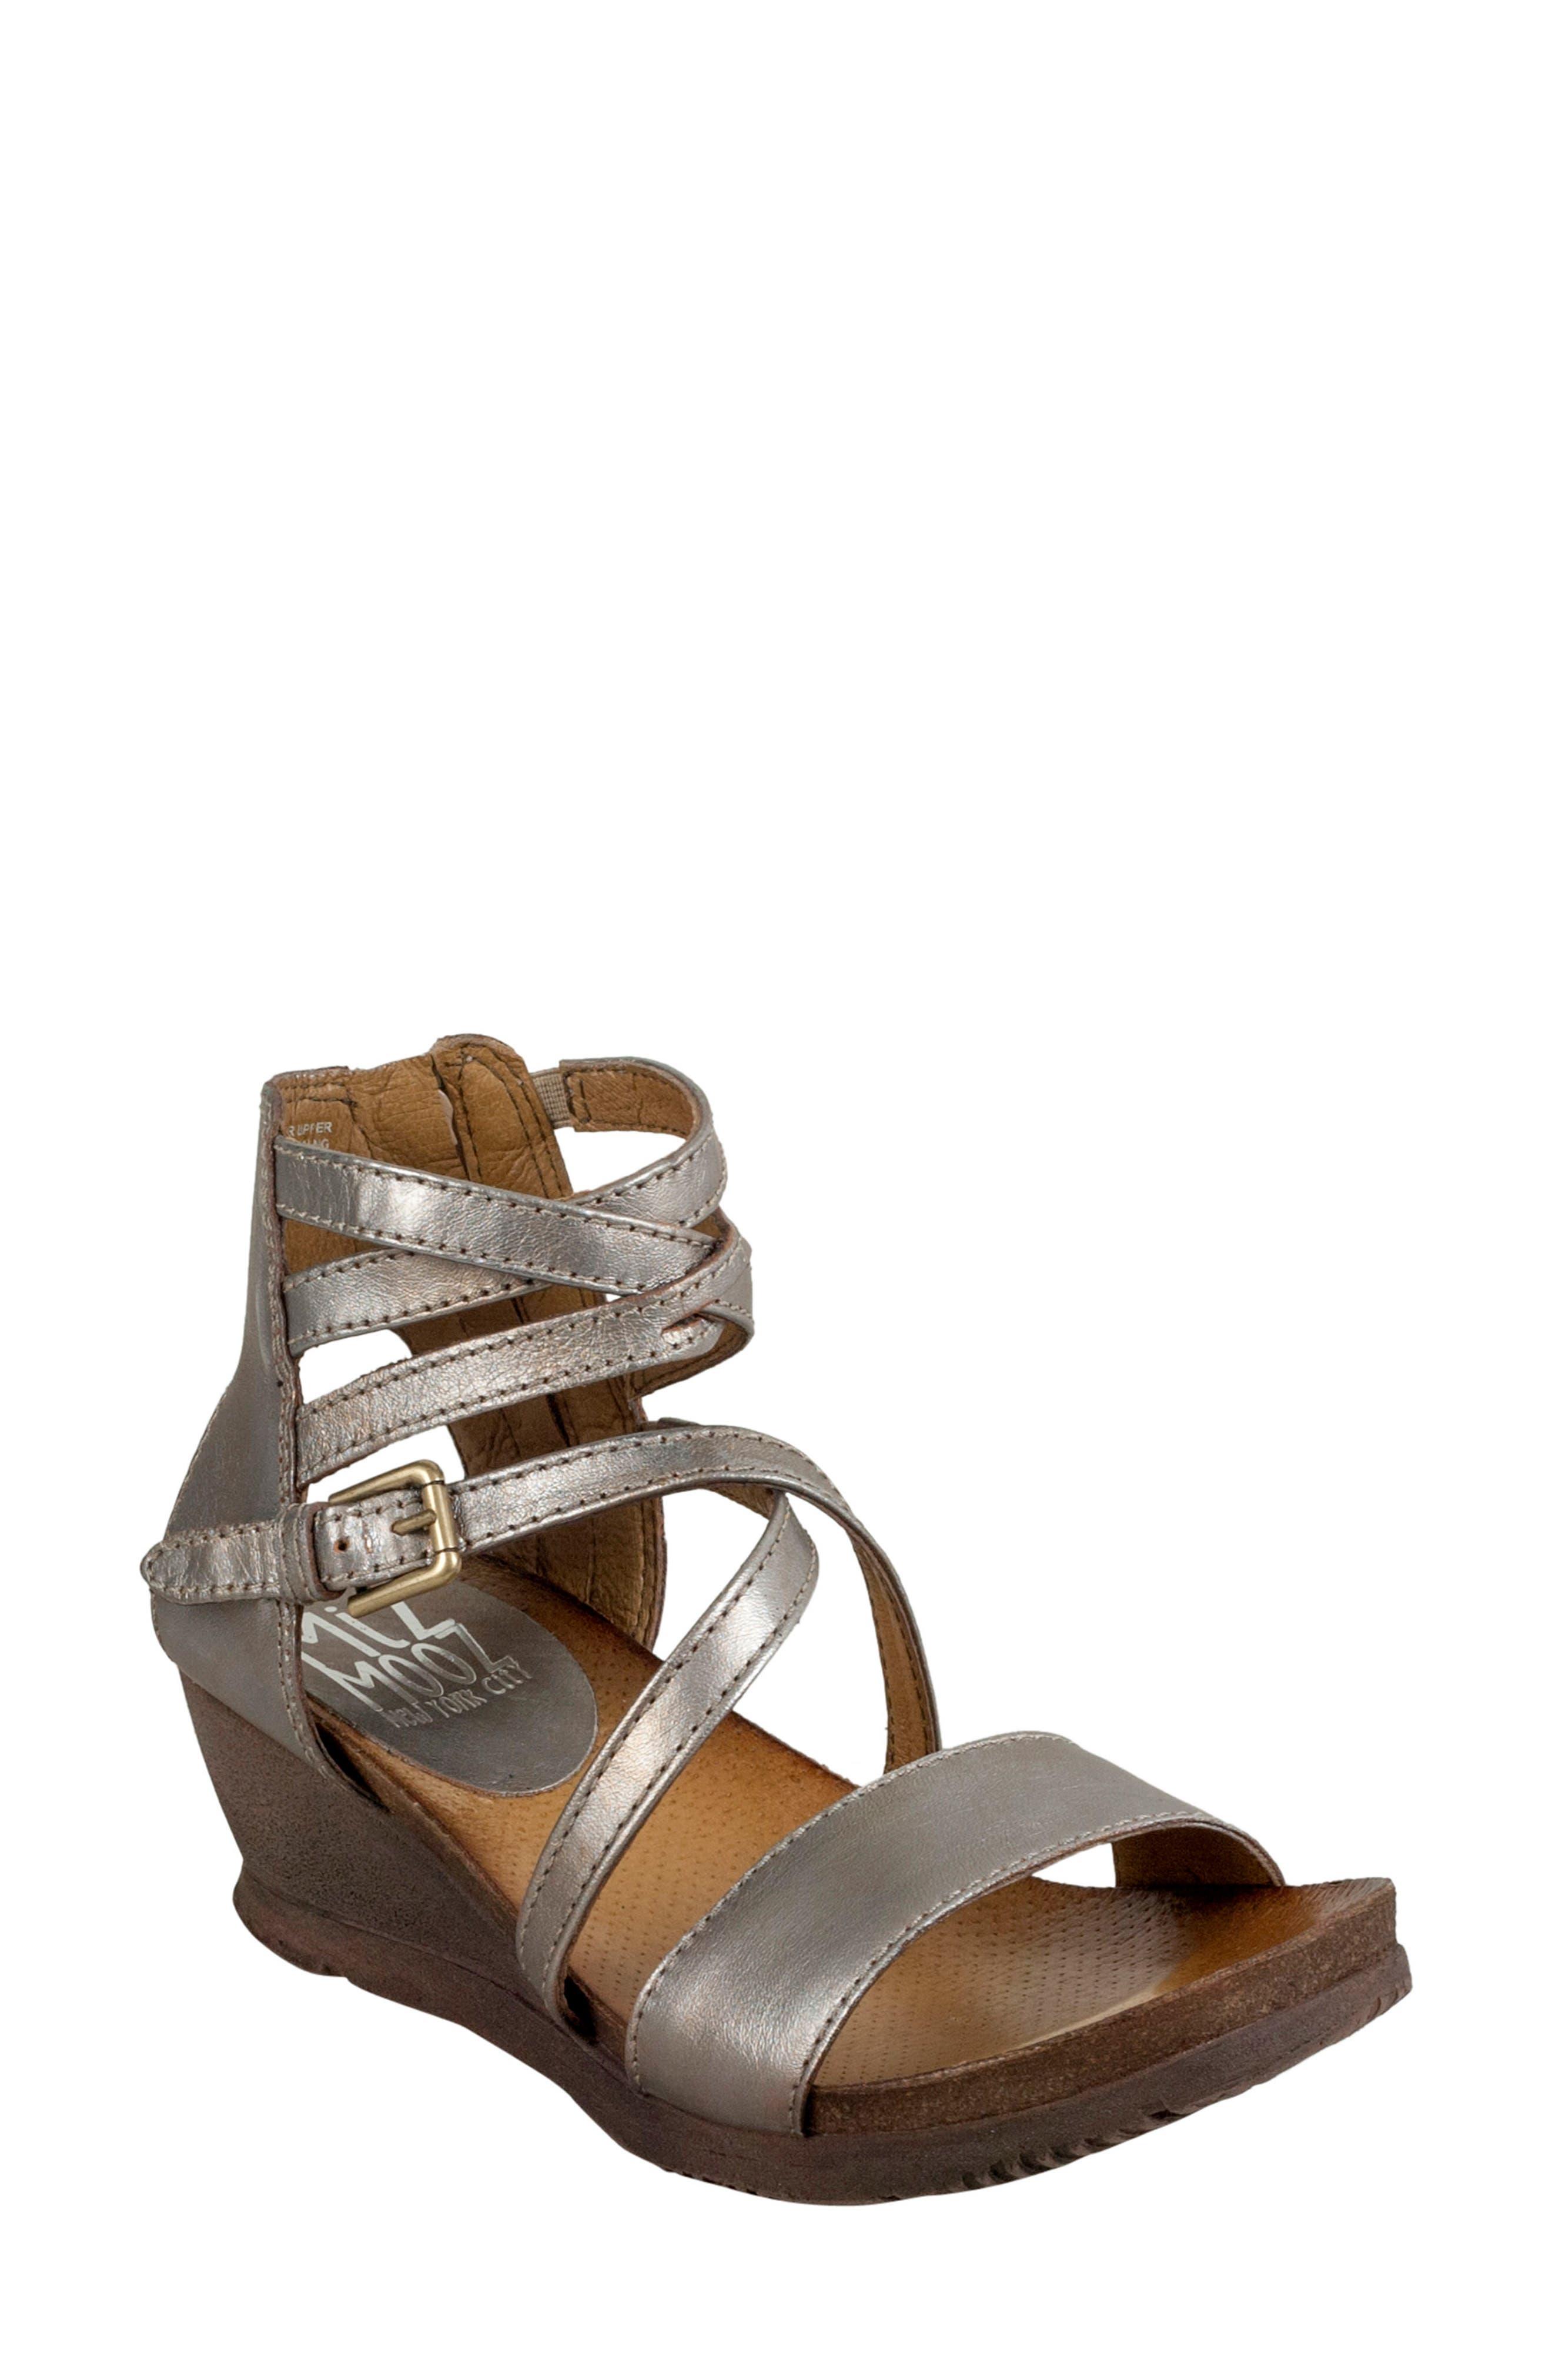 Miz Mooz 'Shay' Wedge Sandal (Women)